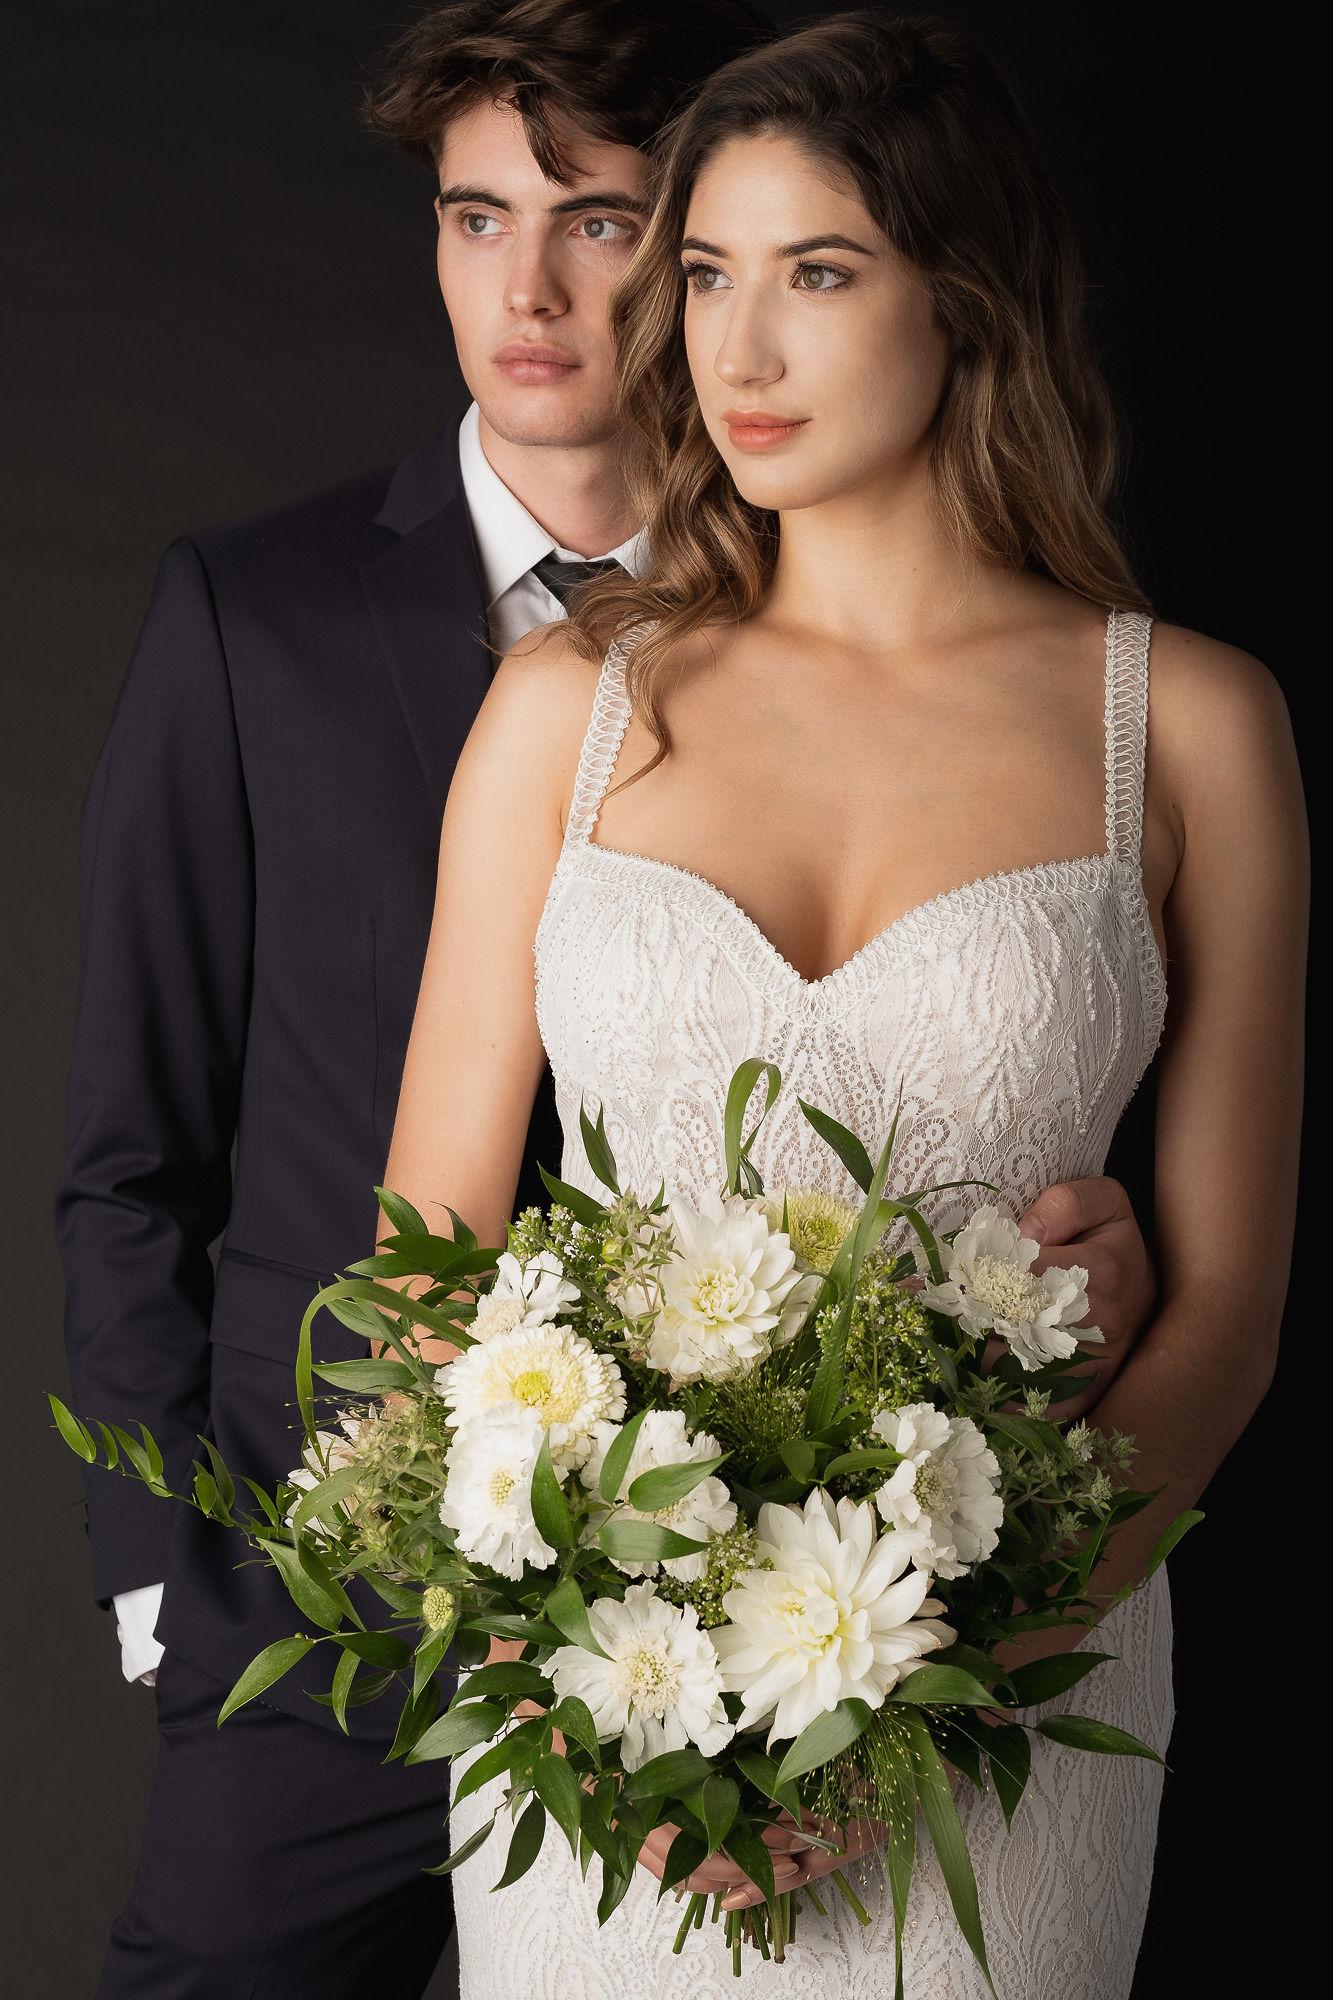 135_Wedding_Portfolio_20190721-Modifier.jpg